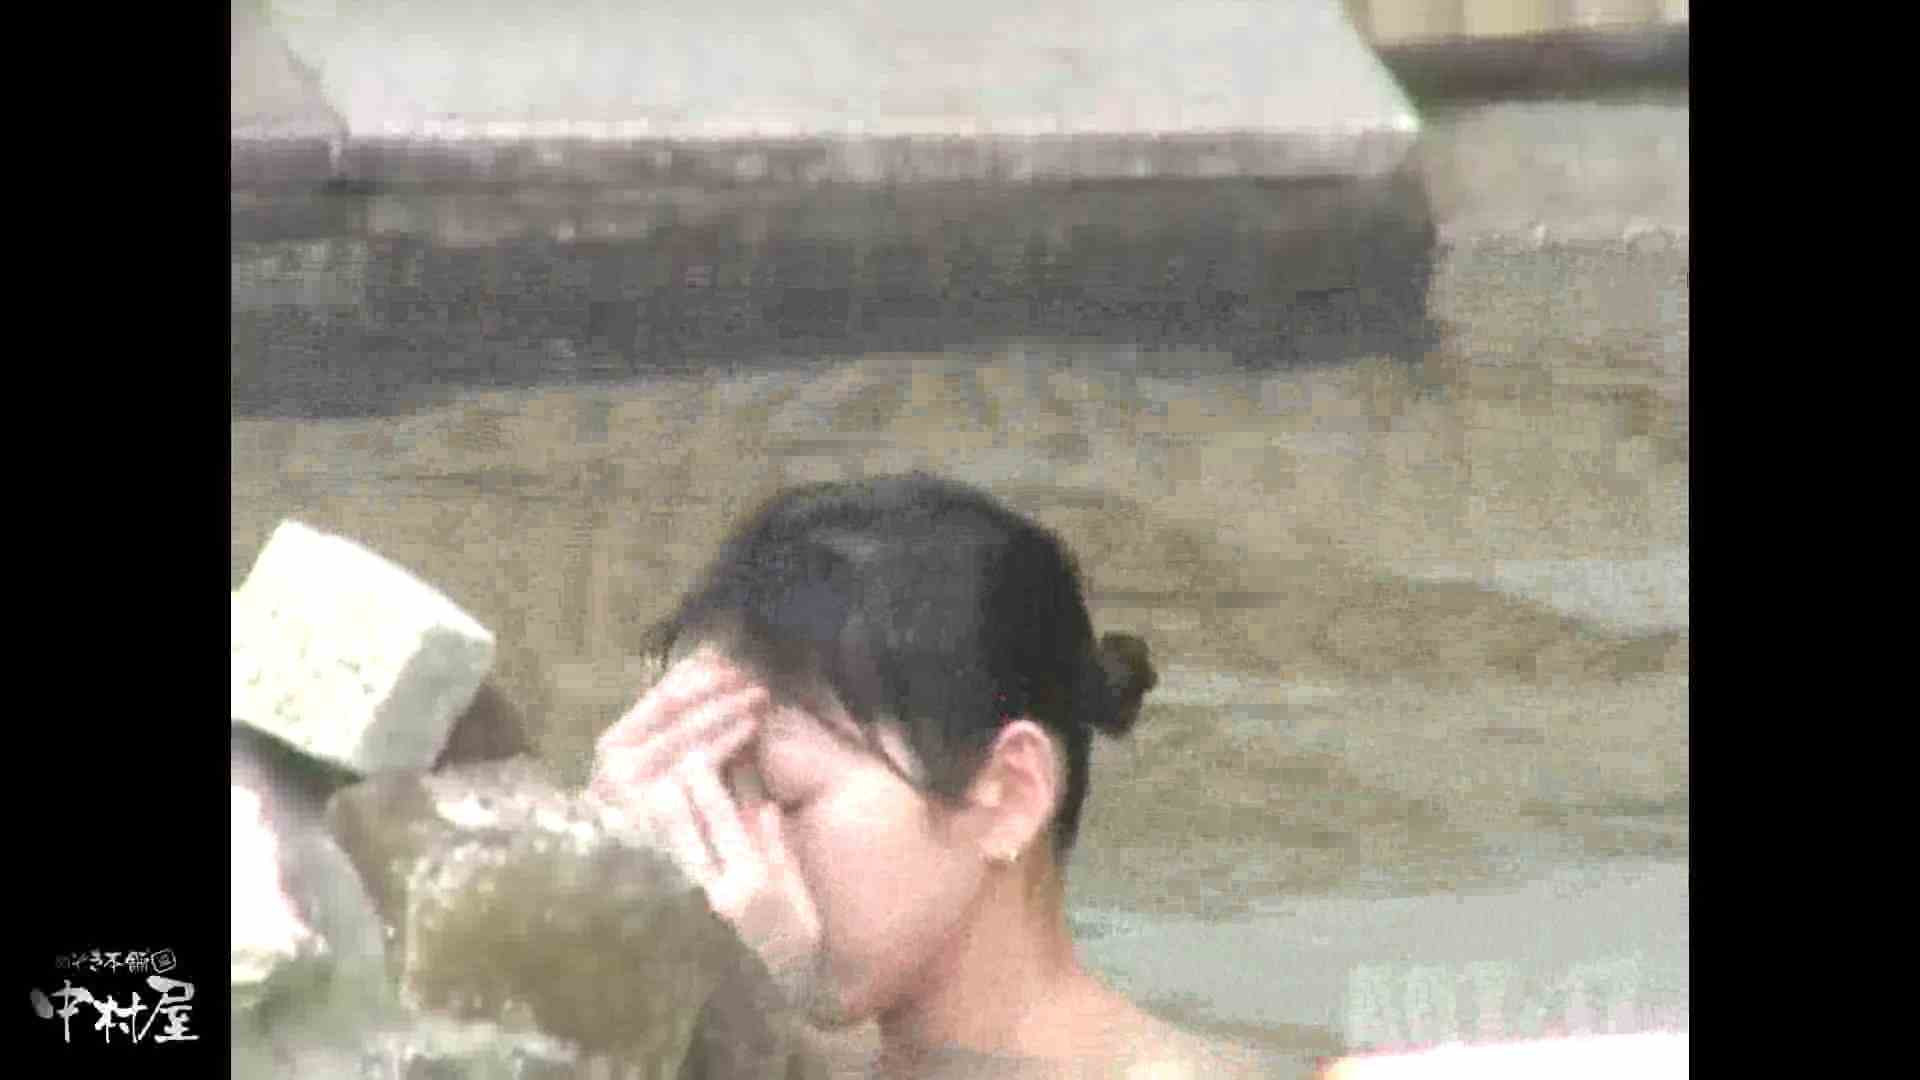 Aquaな露天風呂Vol.881潜入盗撮露天風呂十七判湯 其の三 OLセックス  72画像 44